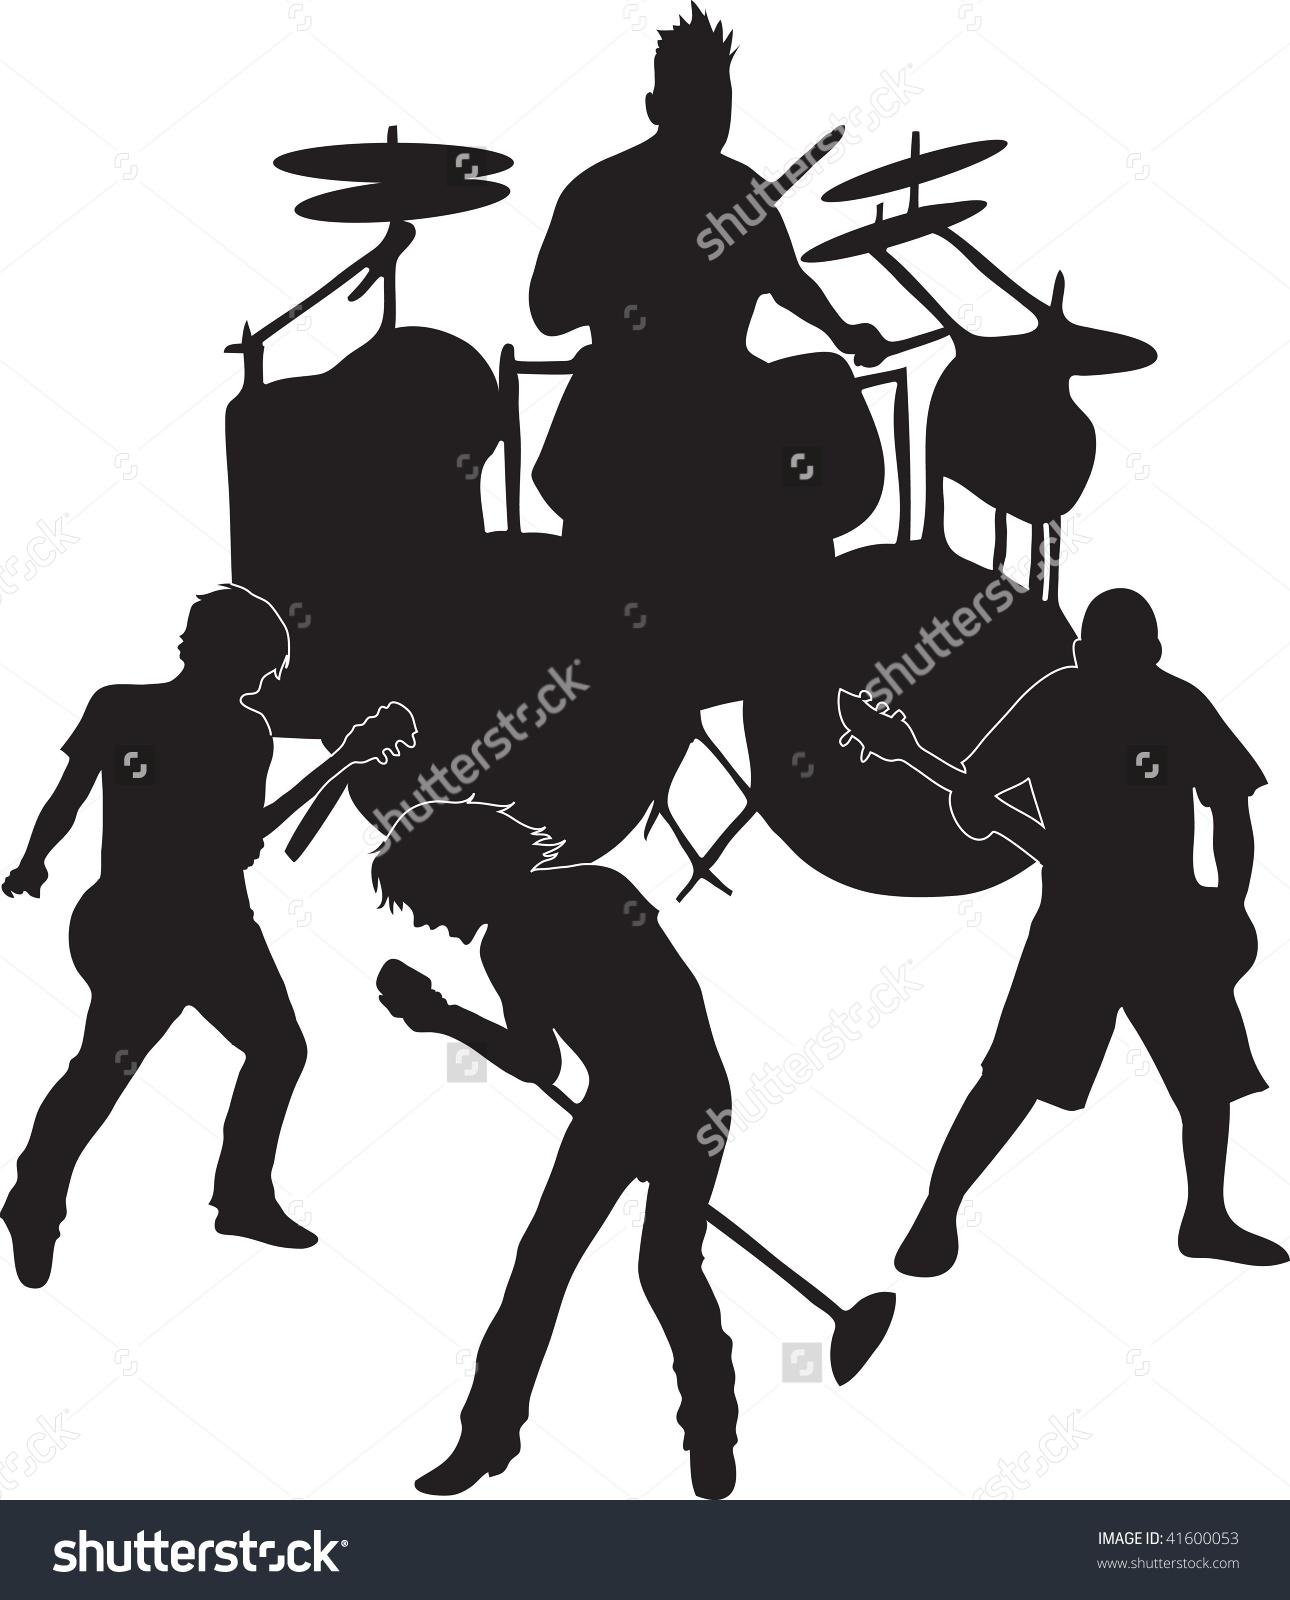 Band Clip Art.